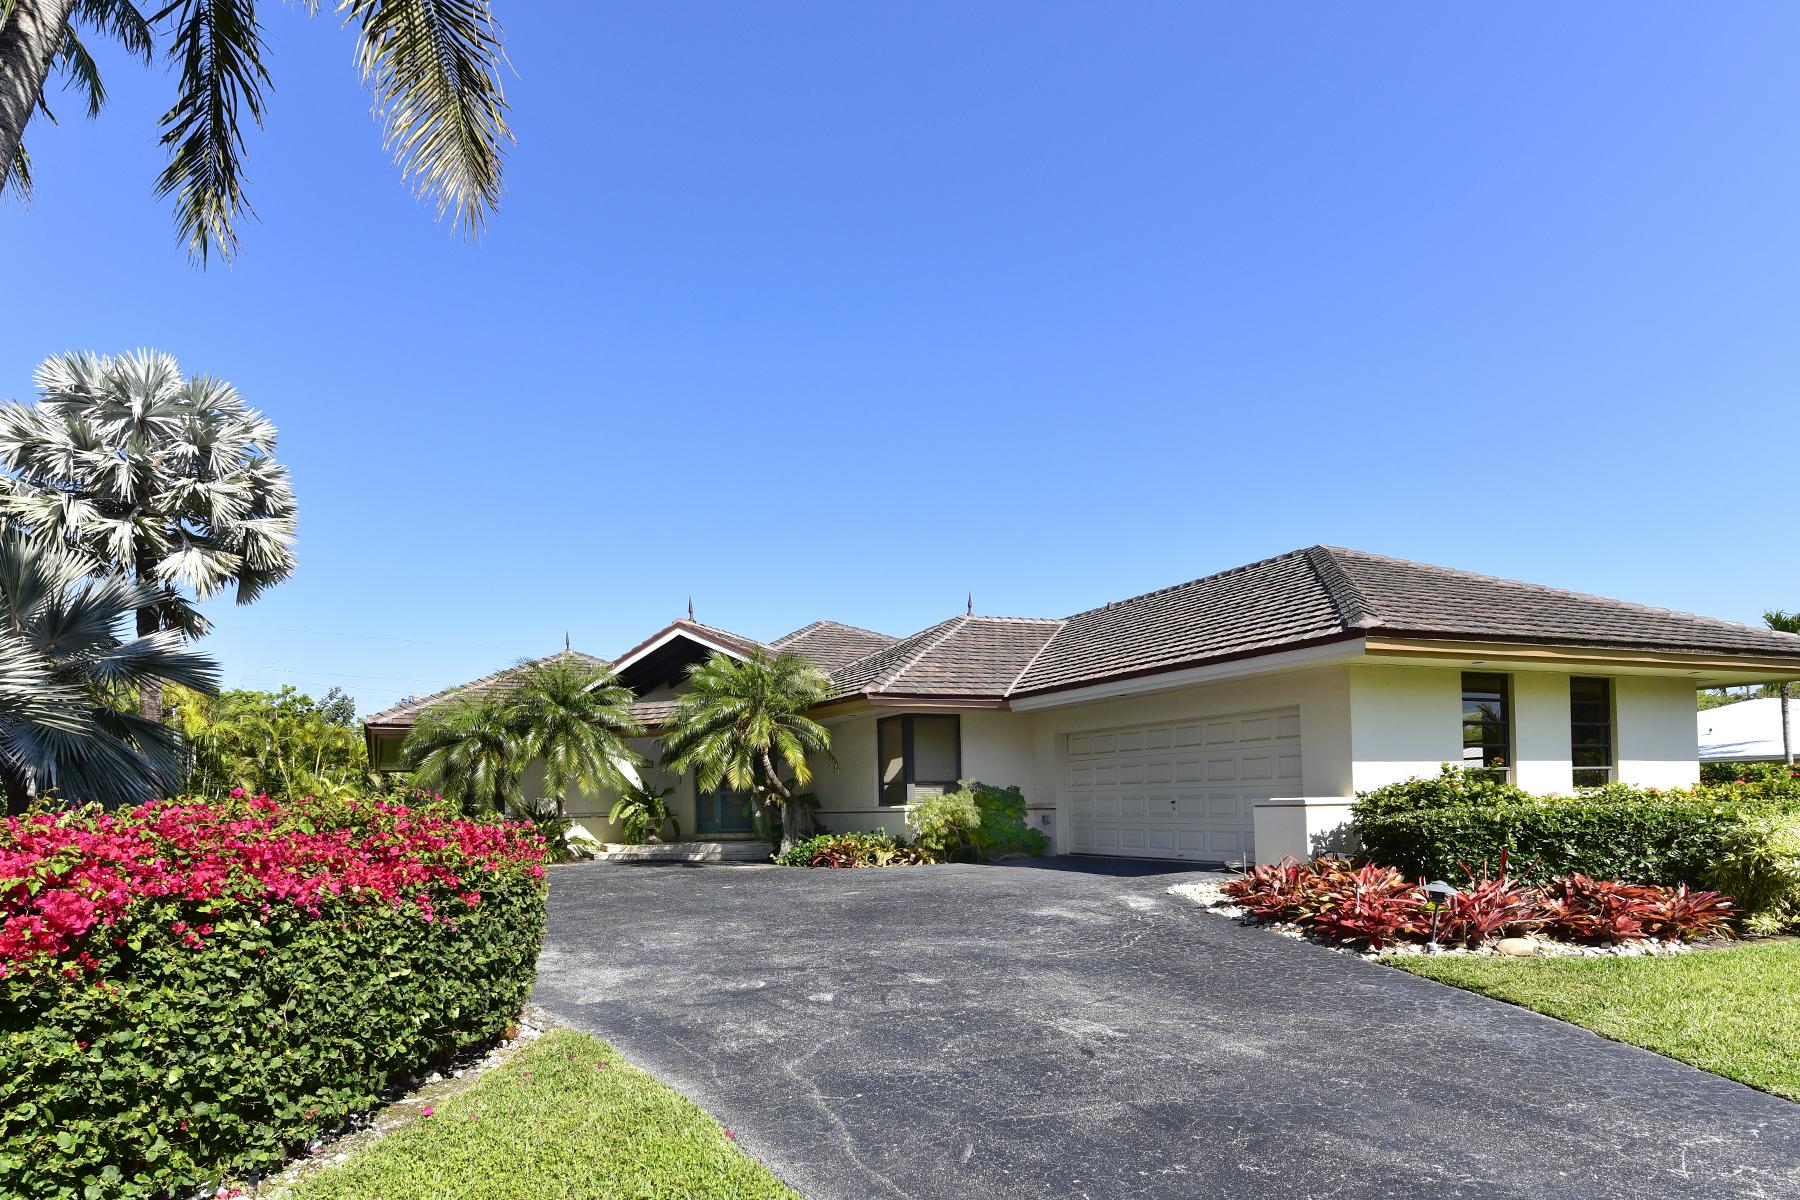 Property for Sale at 12 Bay Ridge Road, Key Largo, FL 12 Bay Ridge Road Key Largo, Florida 33037 United States